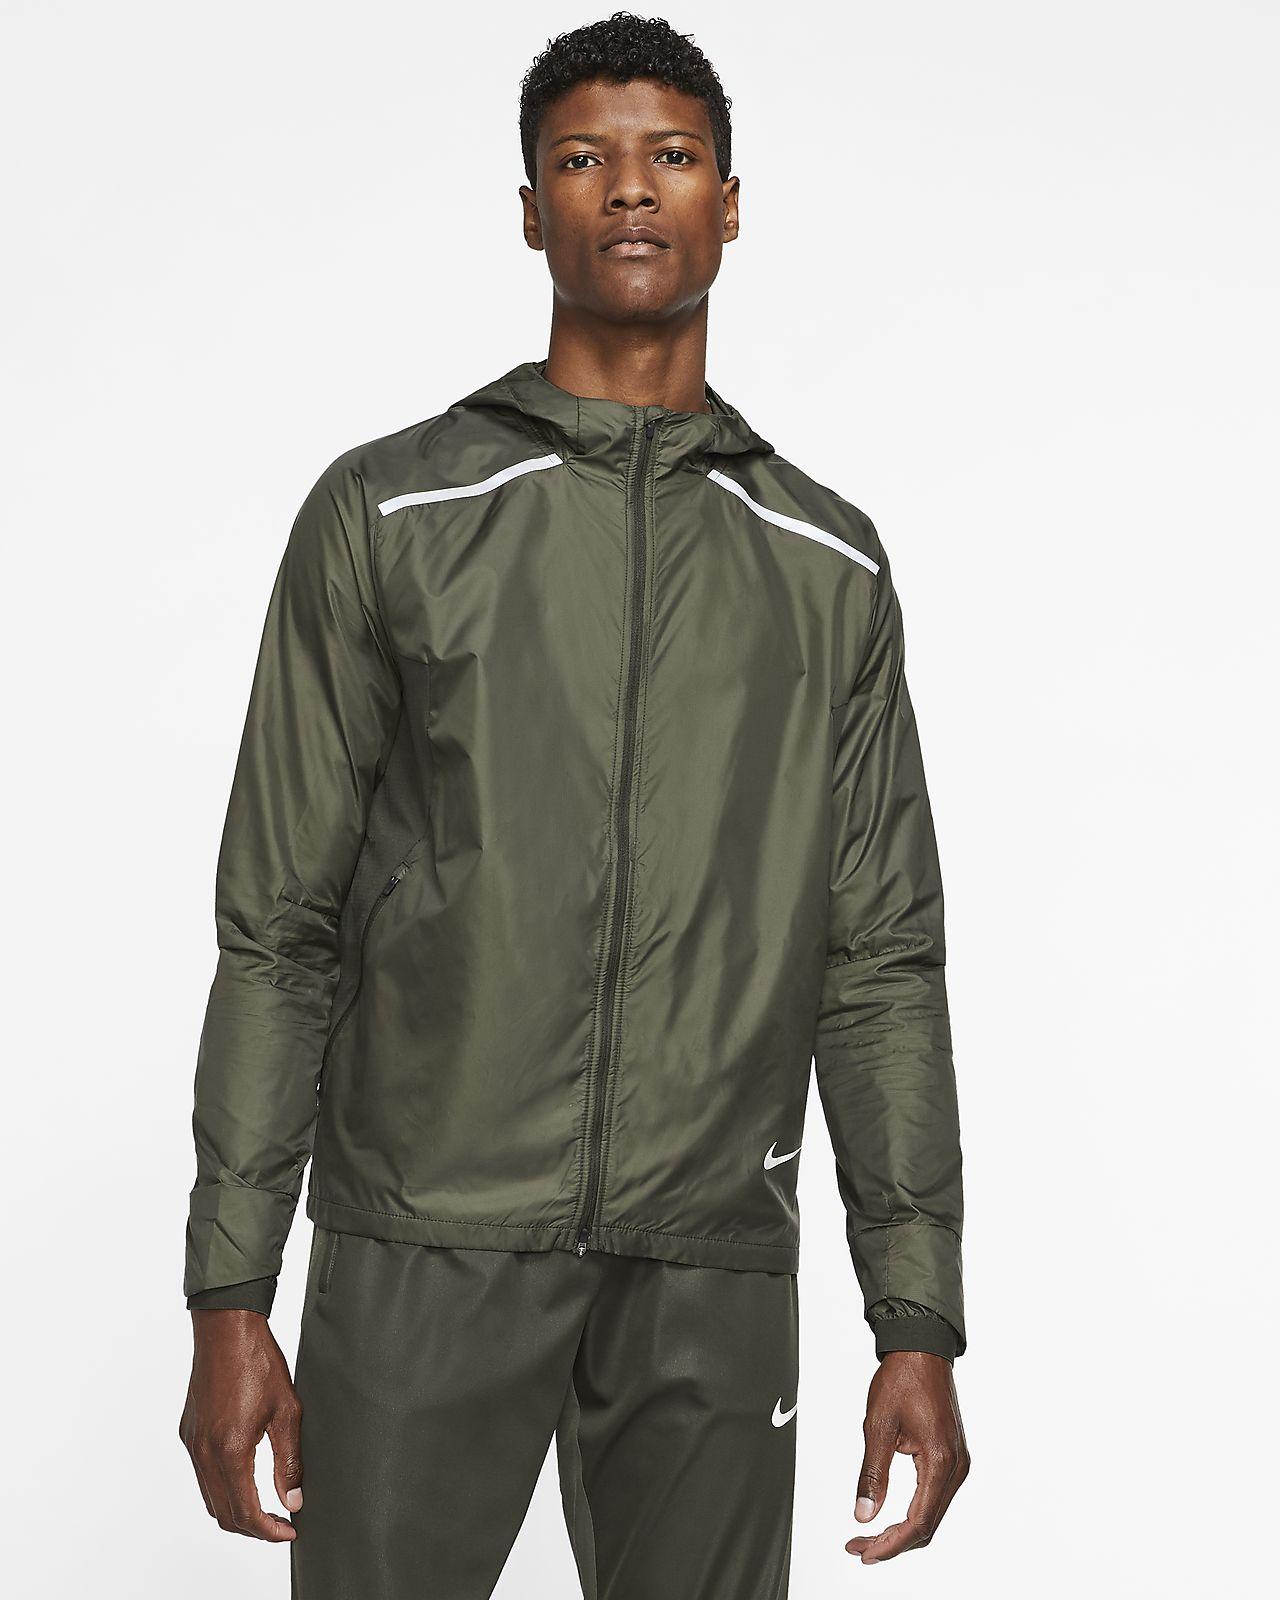 Nike Repel Kapüşonlu Erkek Koşu Ceketi